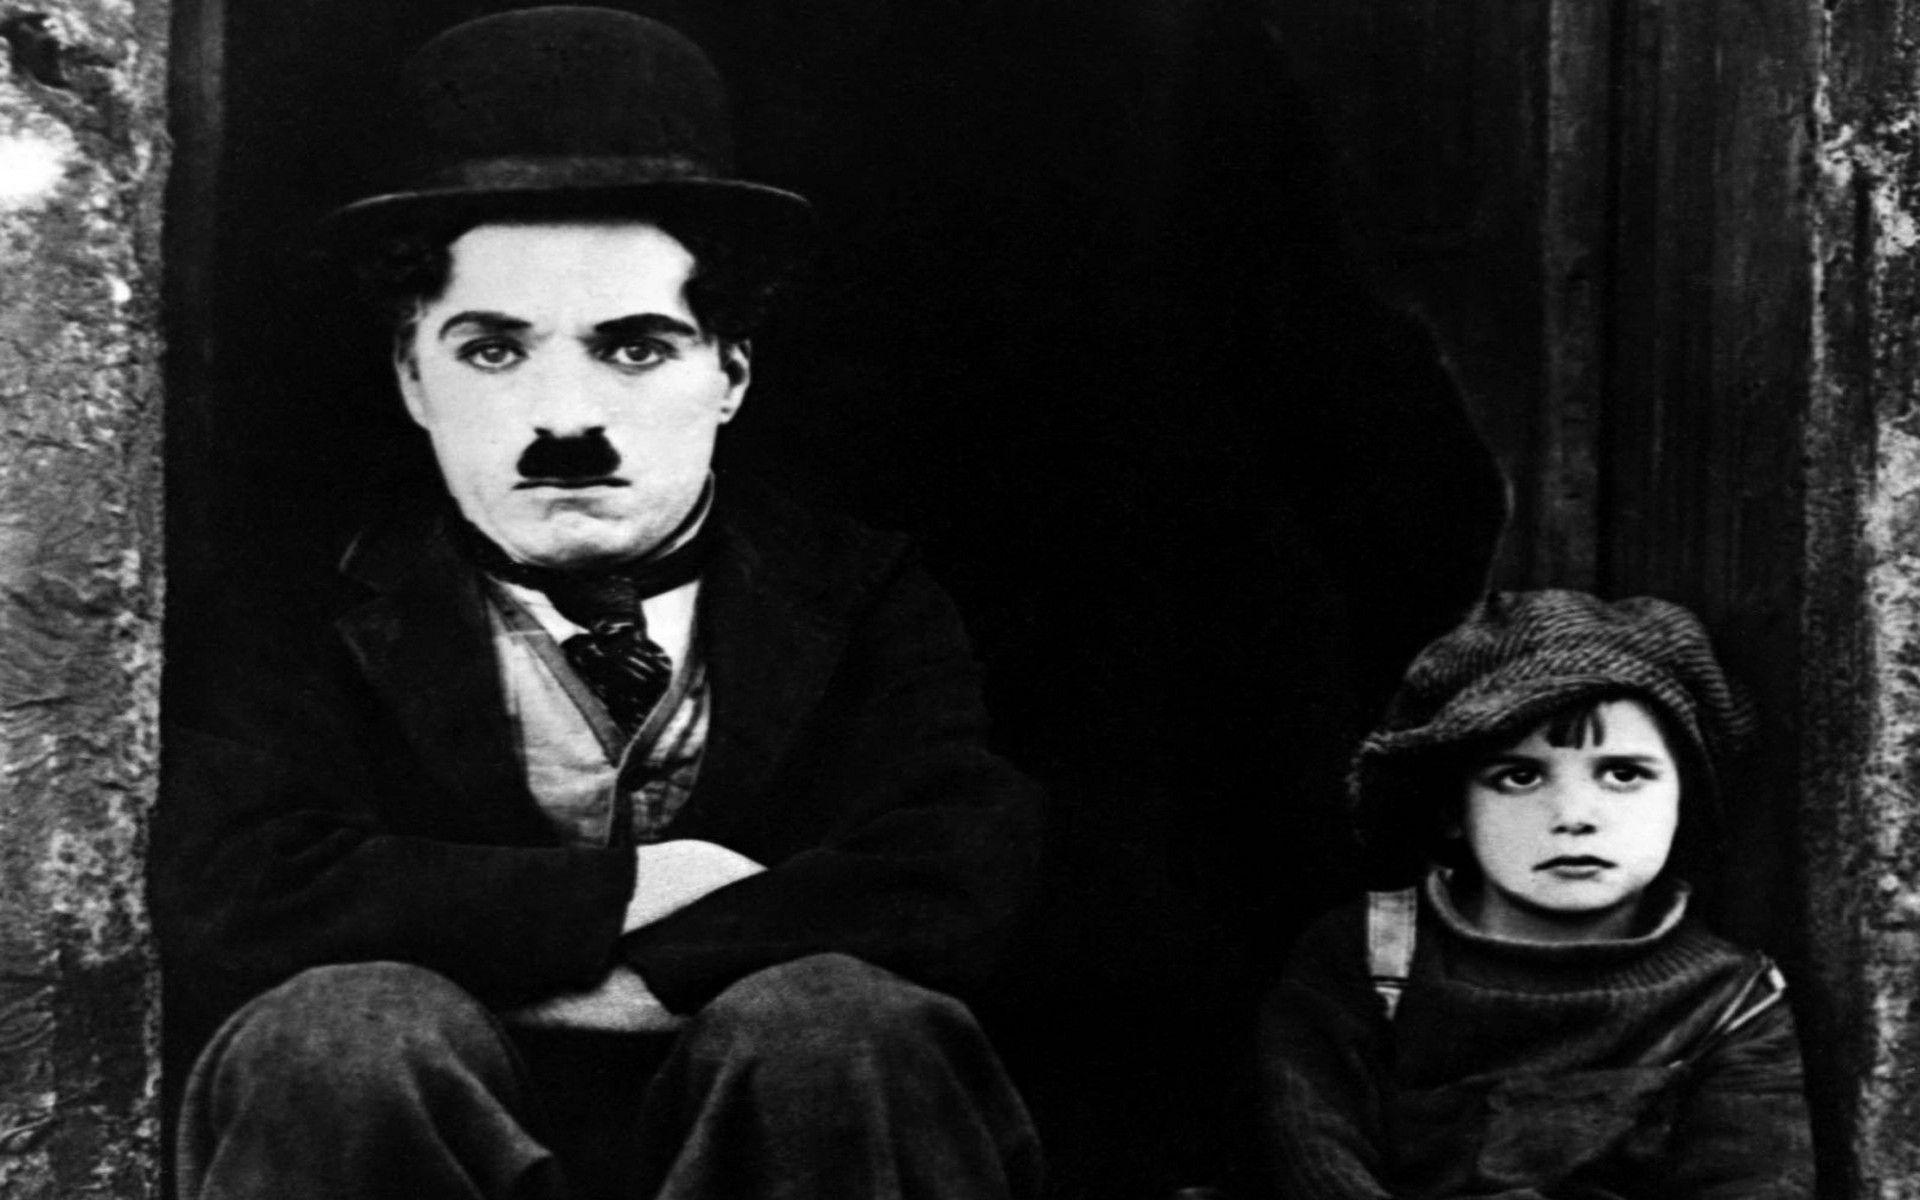 Charlie Chaplin Wallpapers 1920x1200